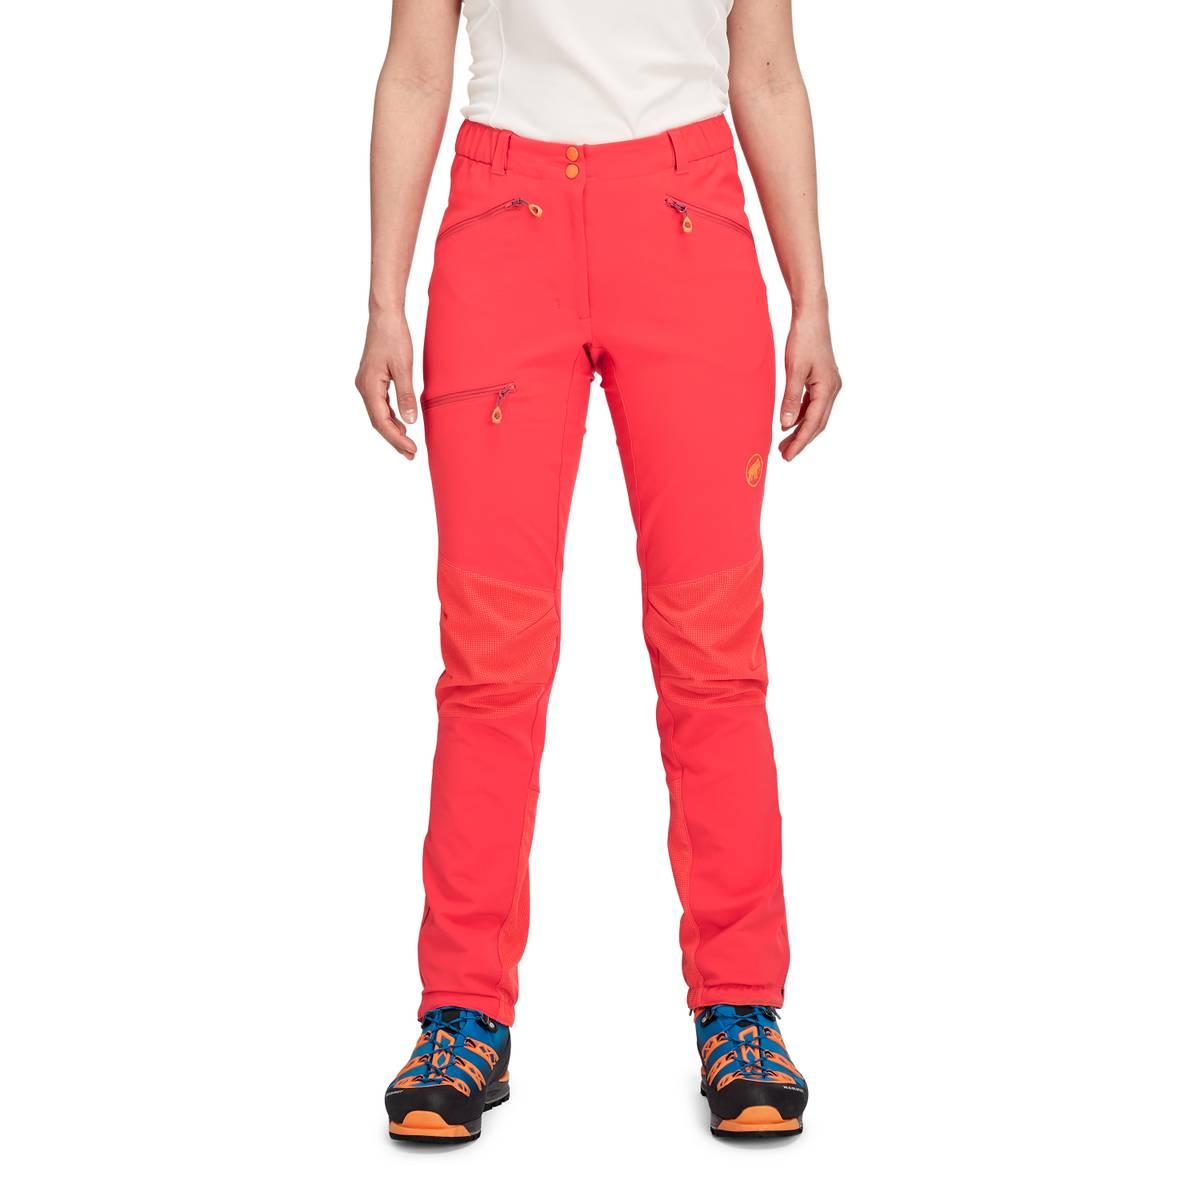 Eisfeld Advanced Softshell Pants for Women Sunset